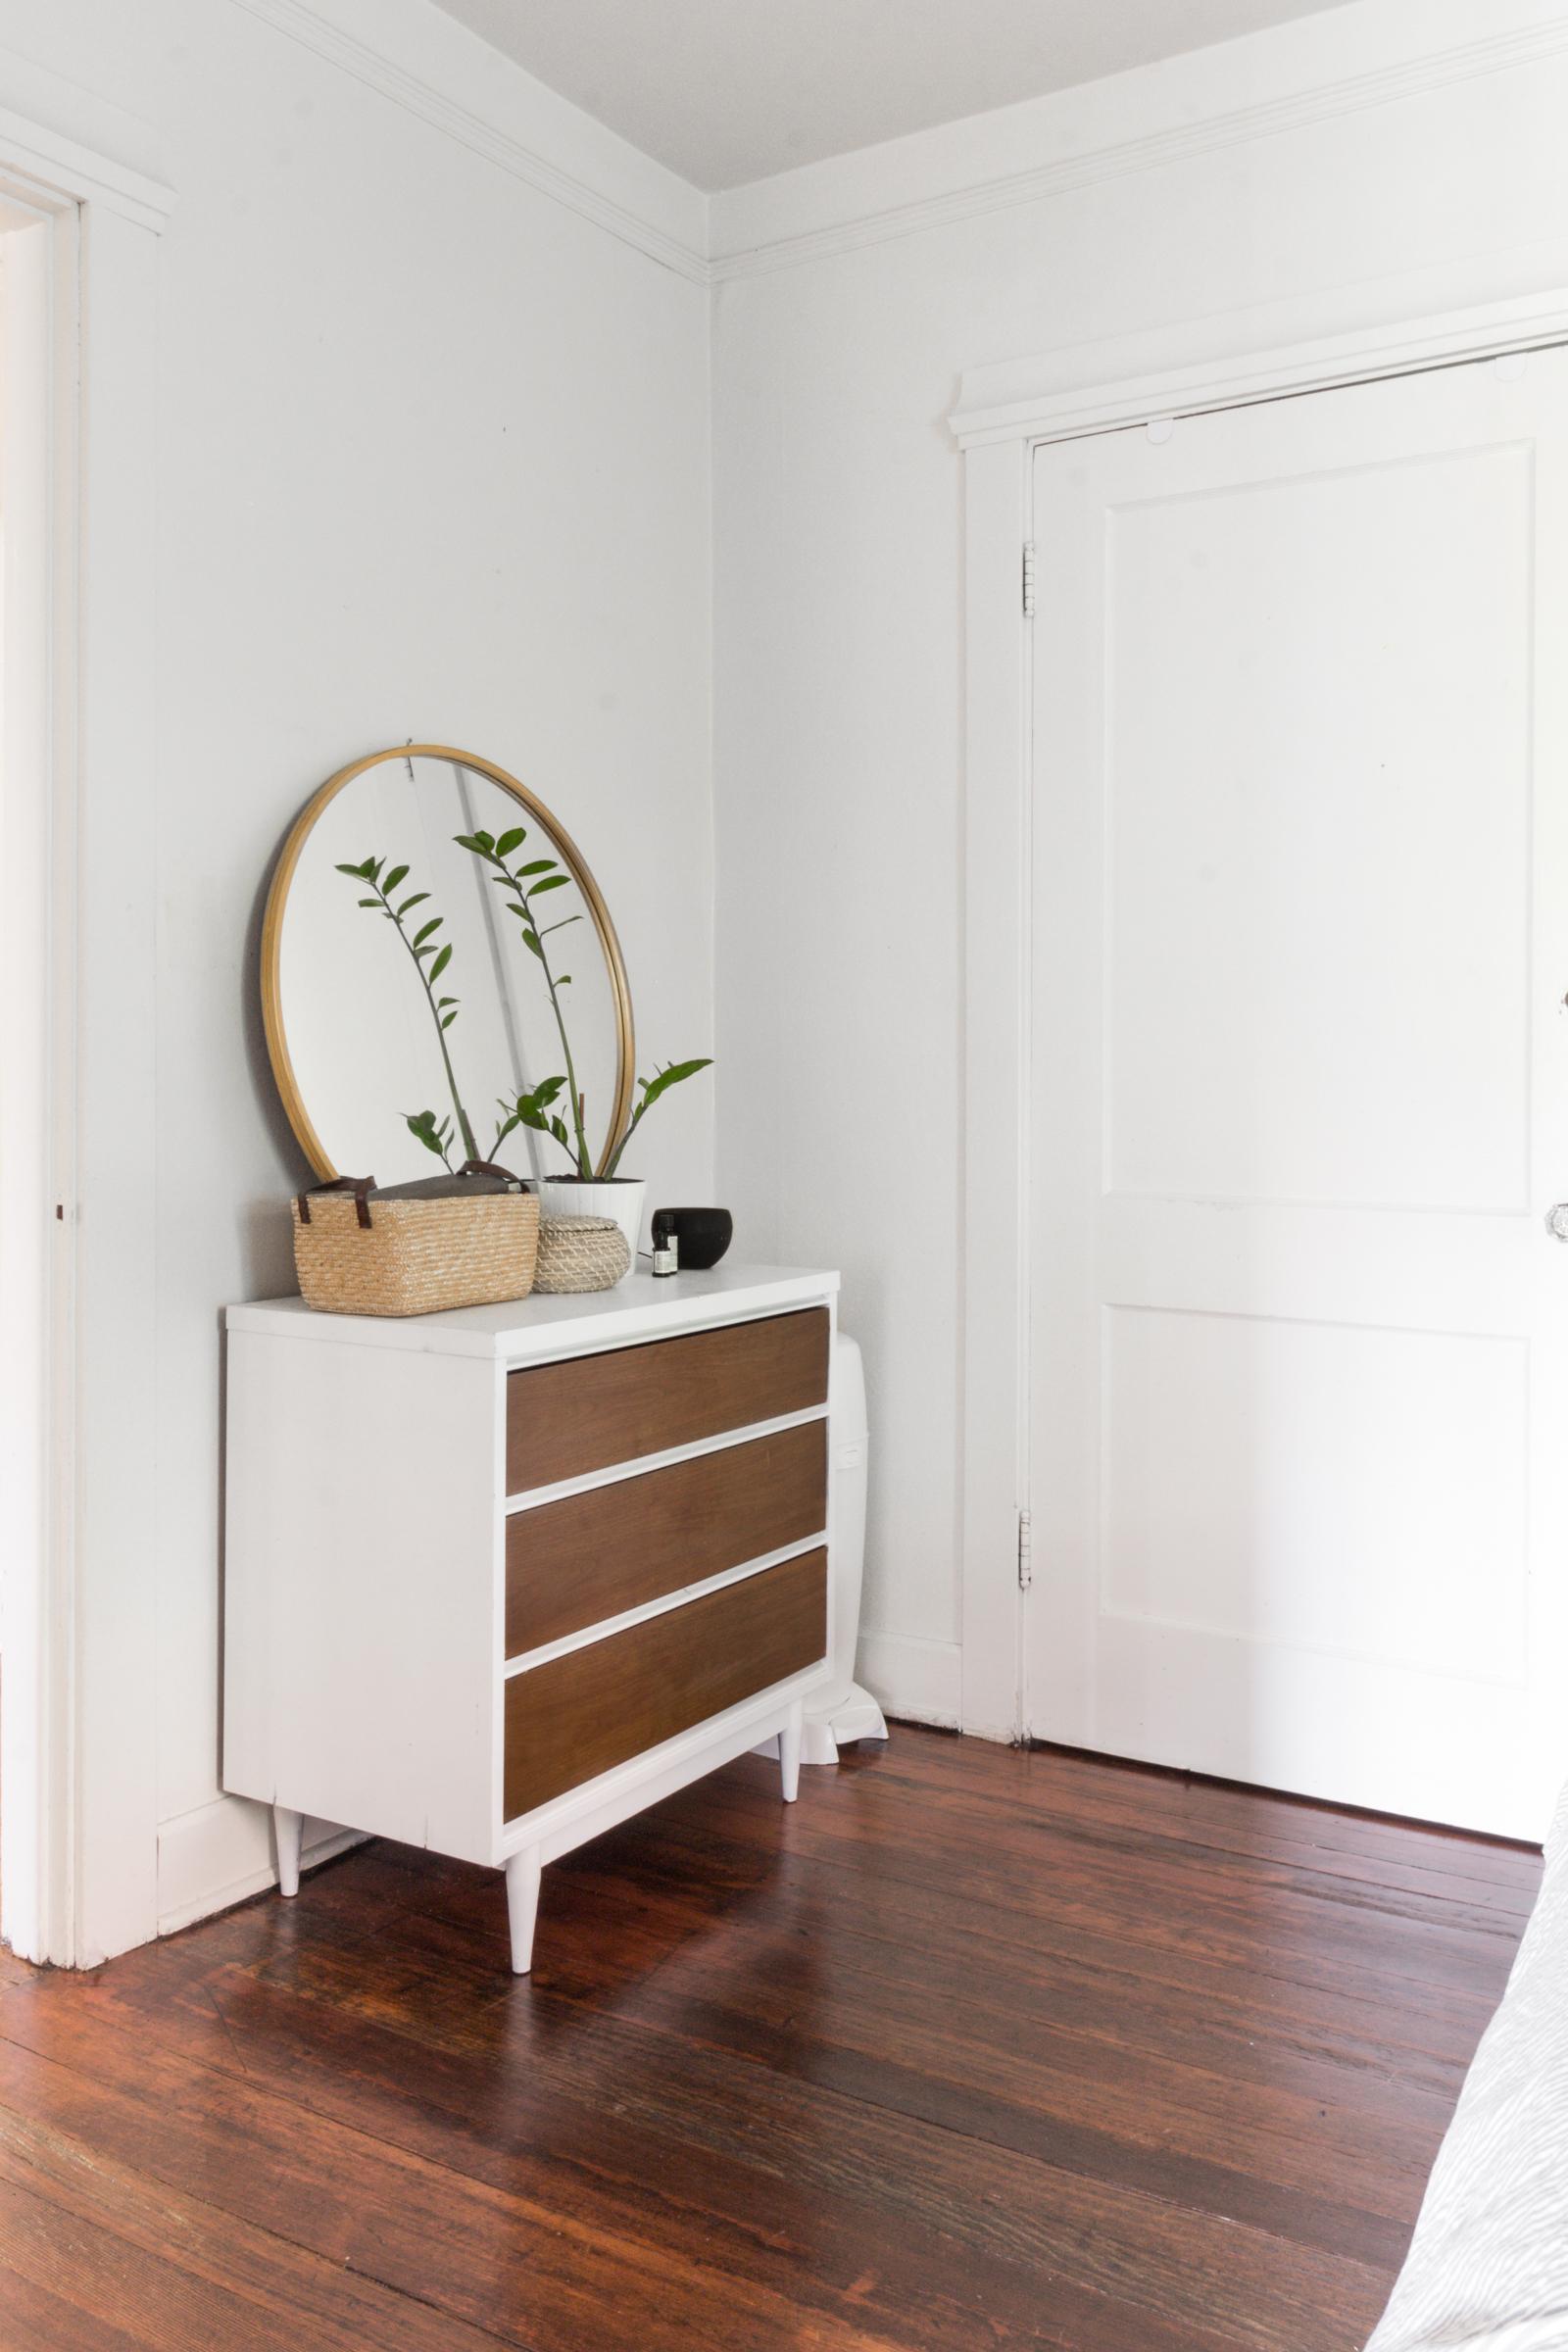 Dresser: Thrifted